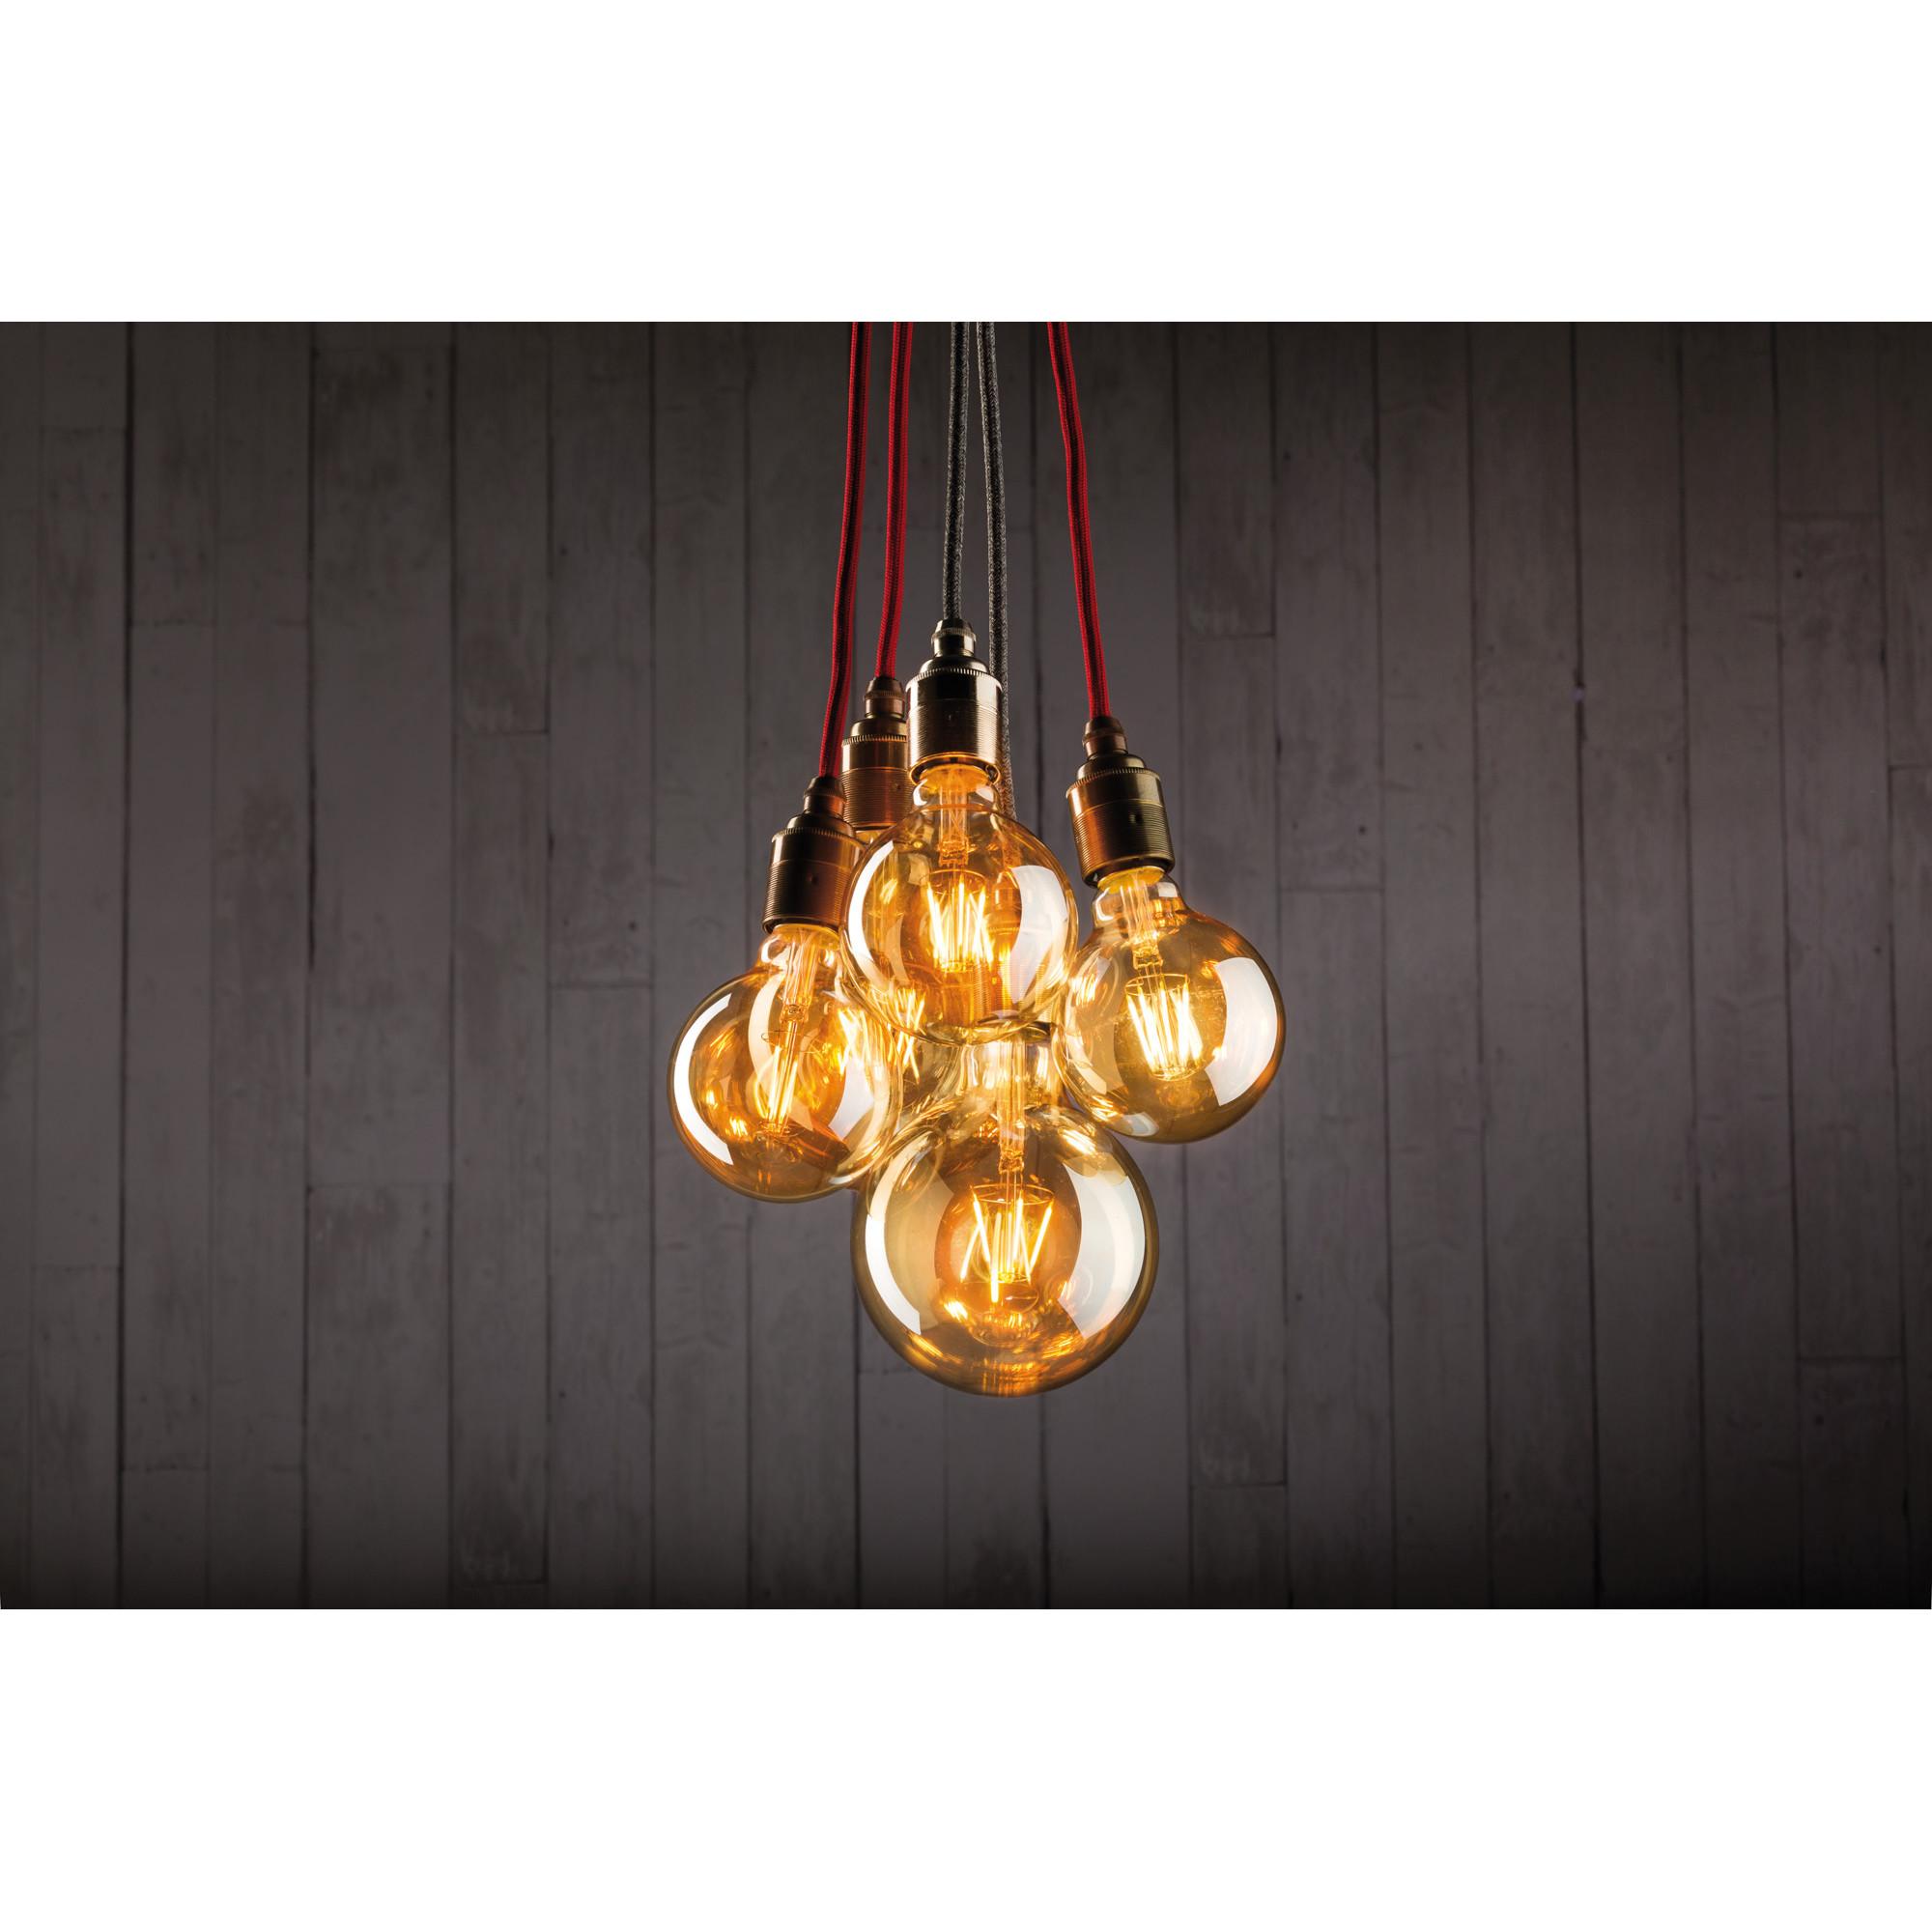 Лампа филаментная Paulmann Шар G95 2.5Вт 170лм 1700К Е27 230В Золото 28388.